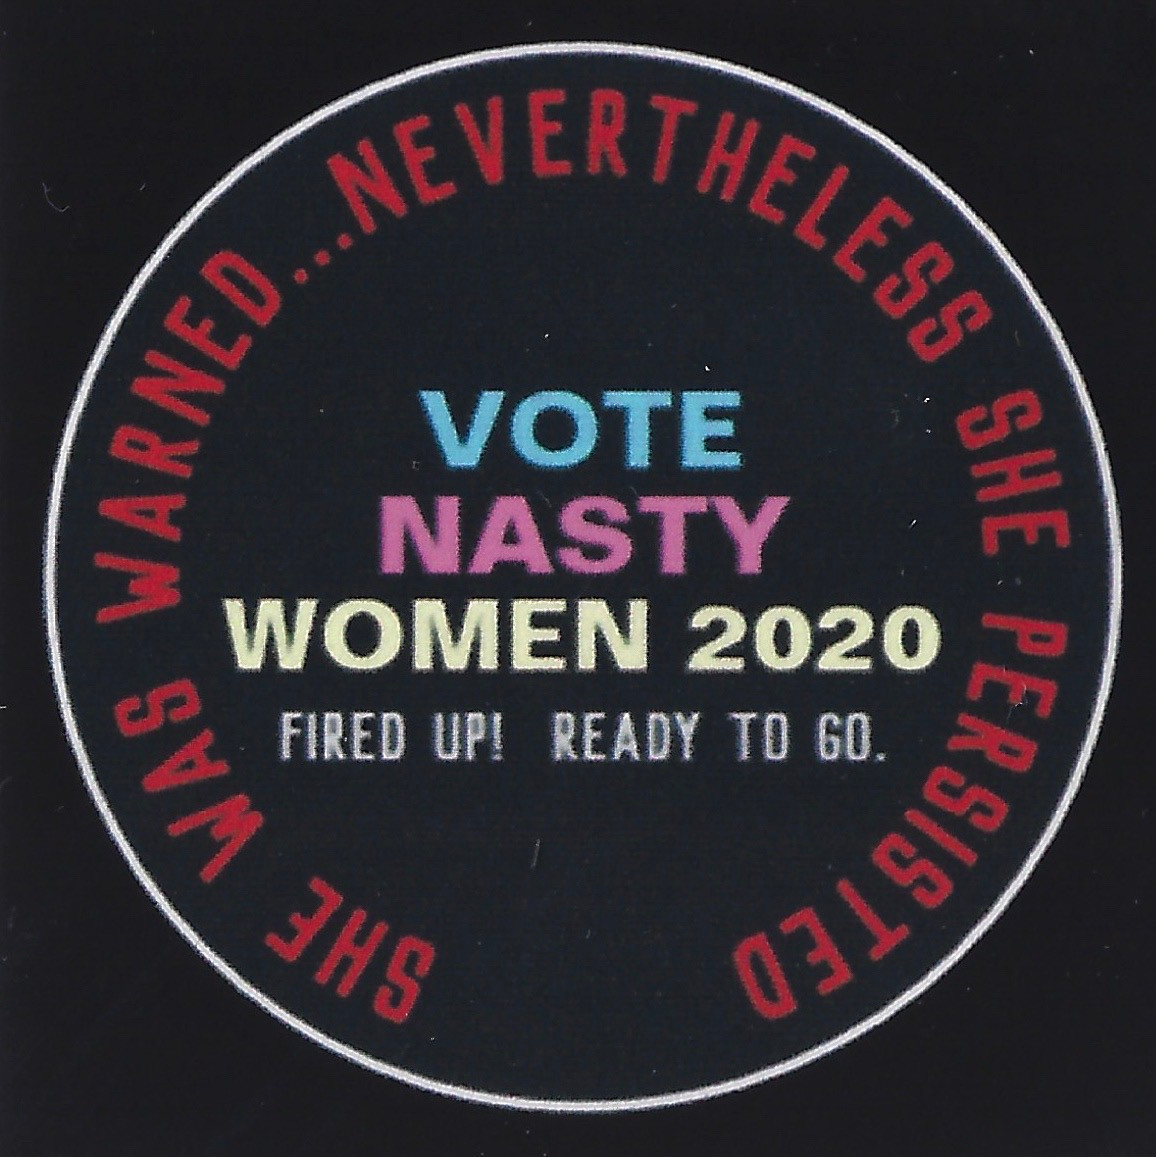 Vote Nasty Women 2020